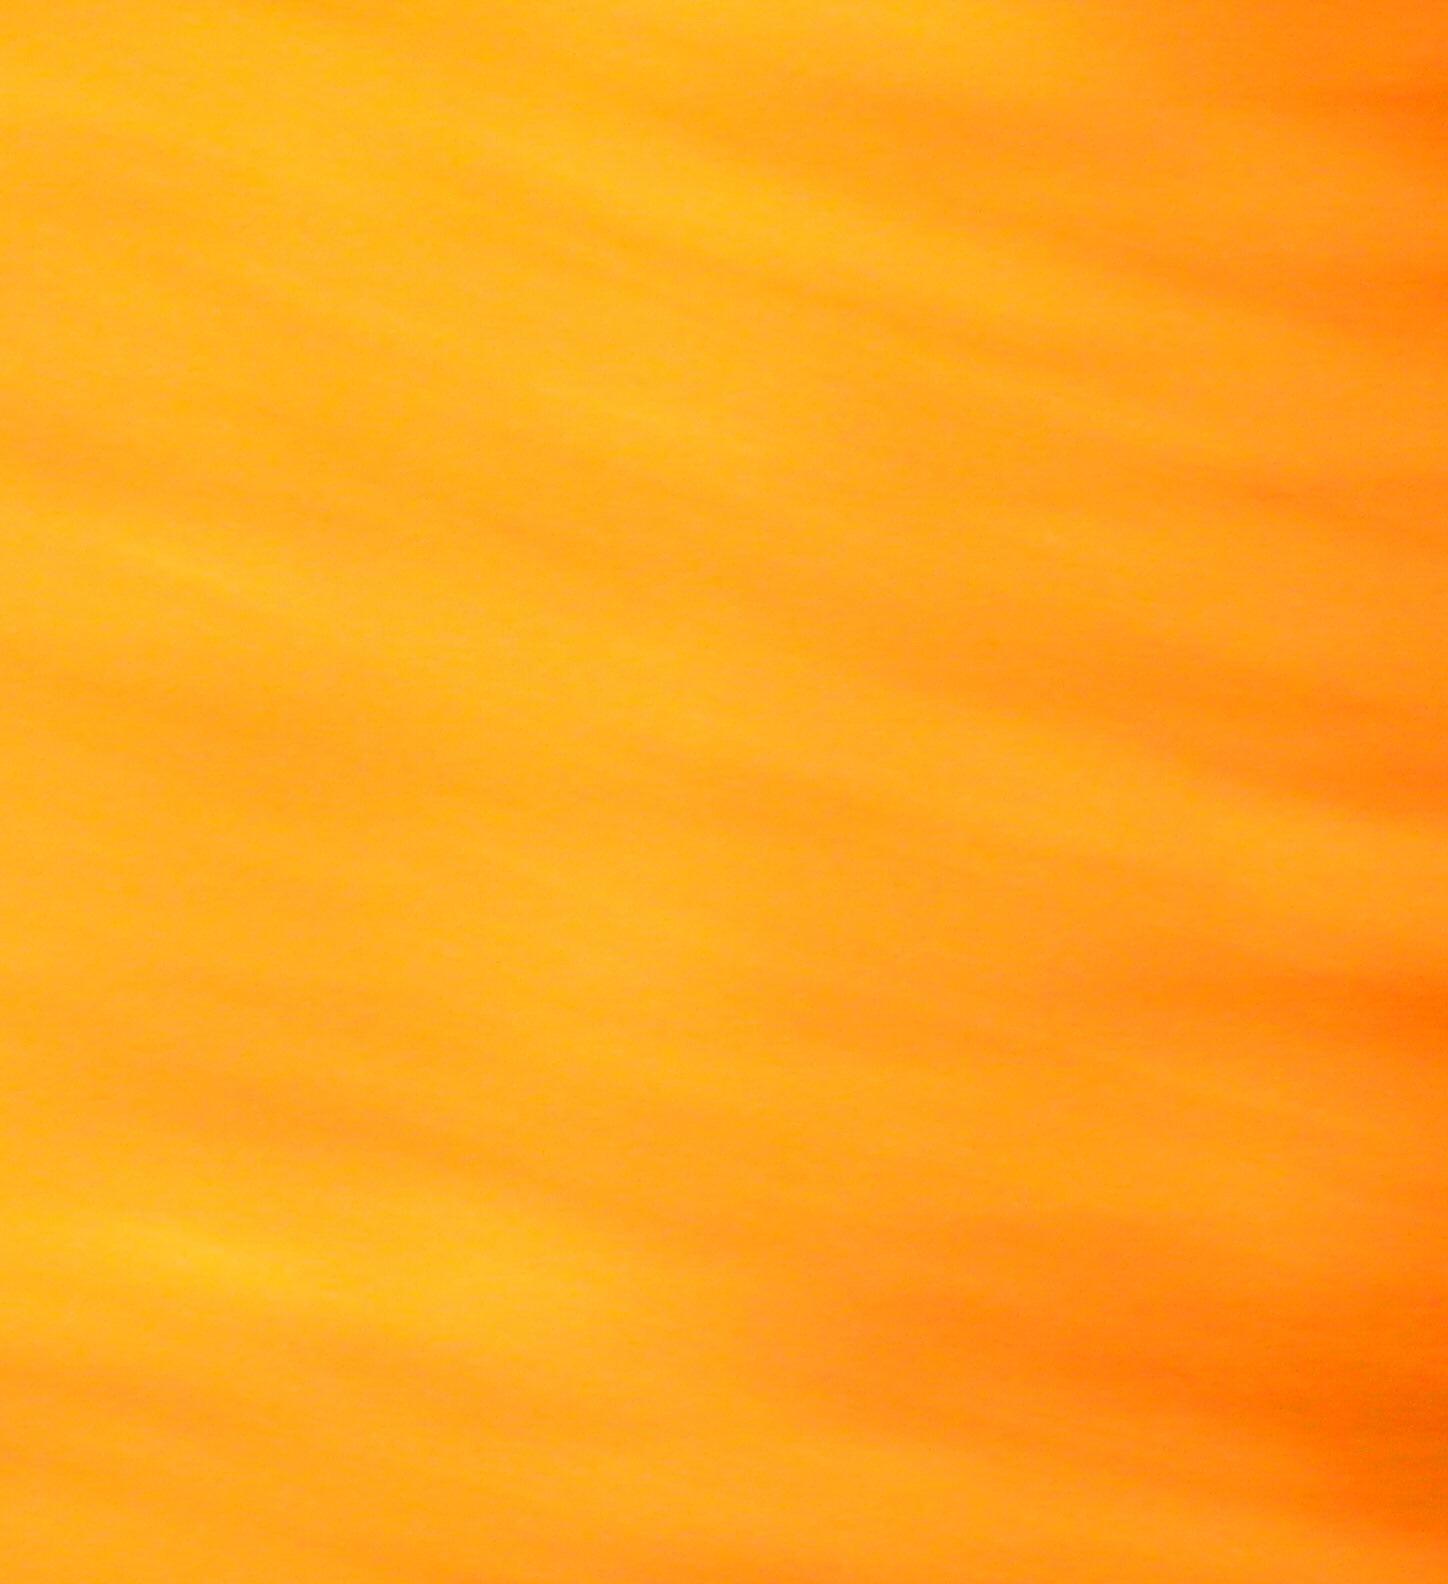 Orange Gradient, Amber, Blend, Bright, Color, HQ Photo